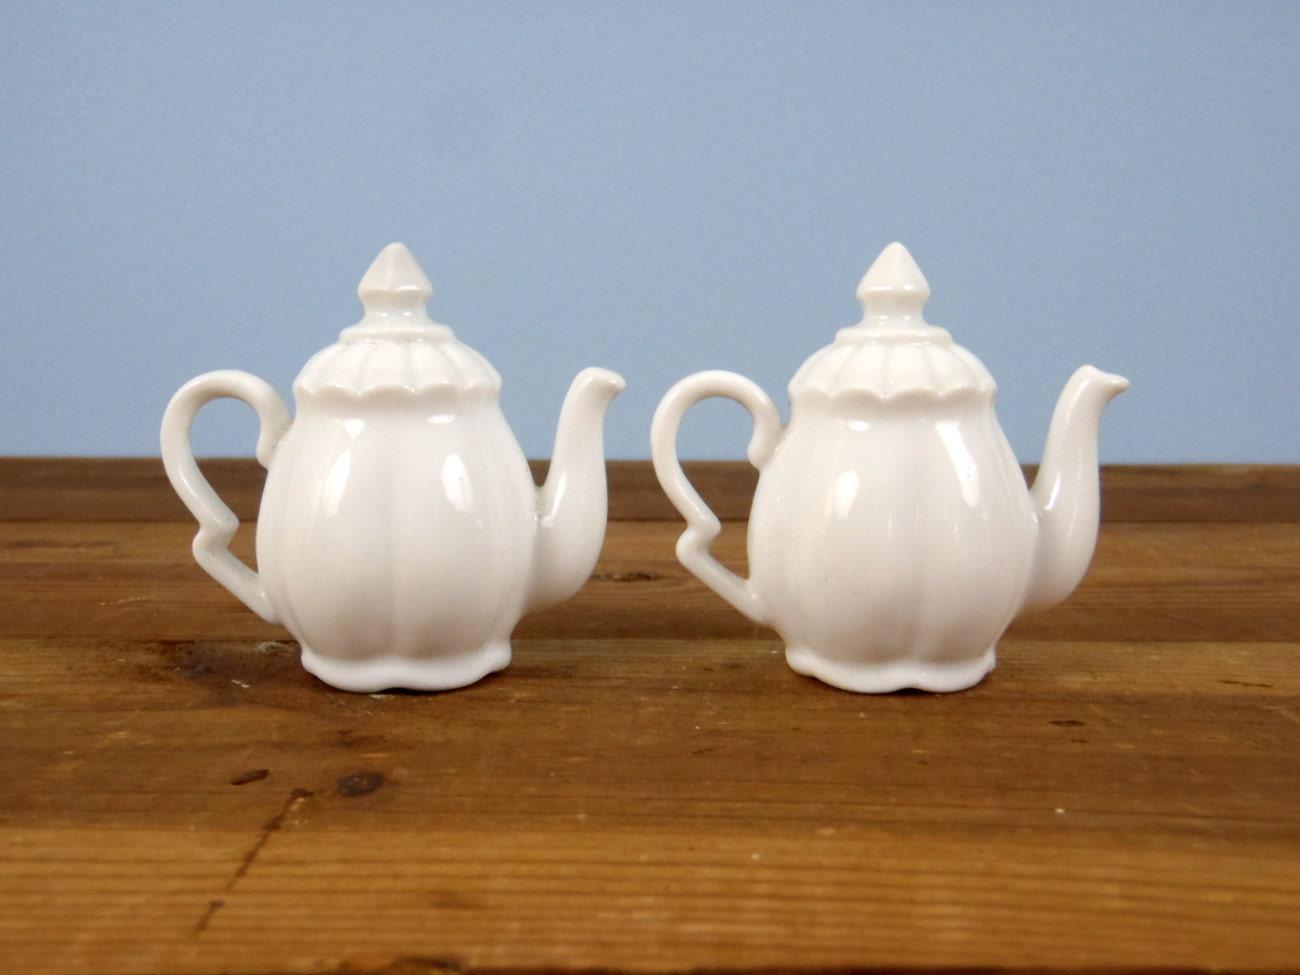 Salt And Pepper Shakers Antique White Porcelain Tea Kettle